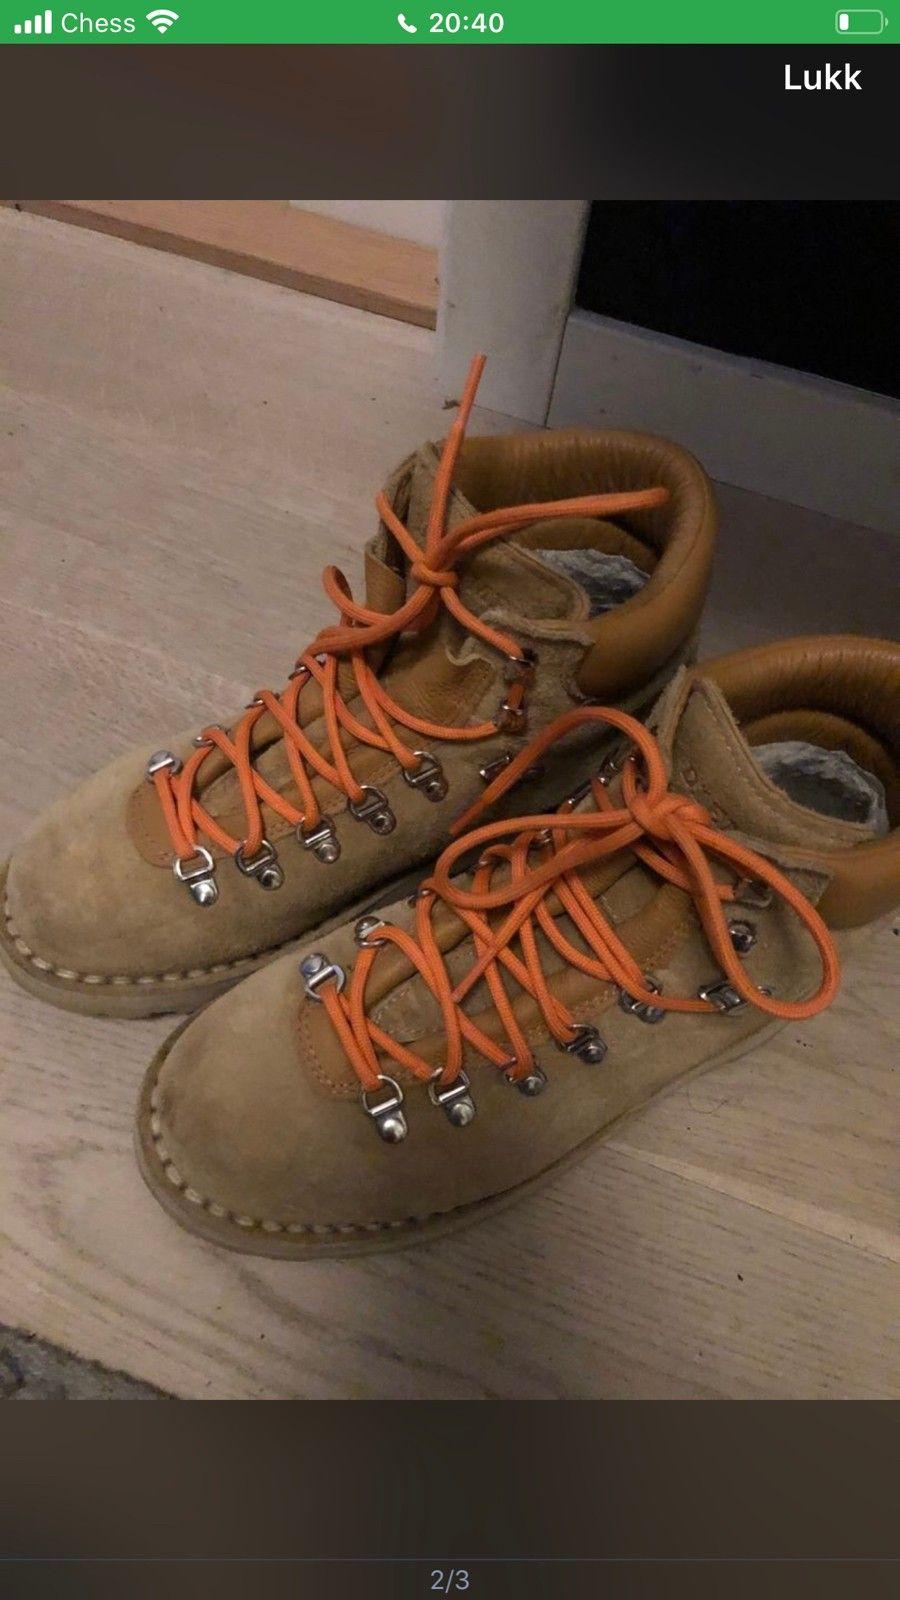 Diemme sko, str 40 | FINN.no